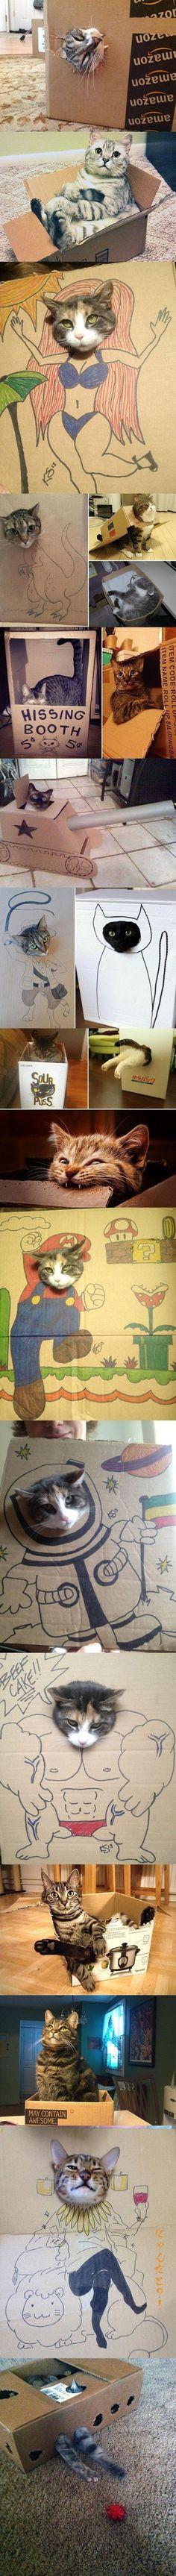 #funny #cats #cutest #cat #sweet #animals #lovely #carton Follow me :) ✧ ☾ @ Sky Paradise @ ☾✧